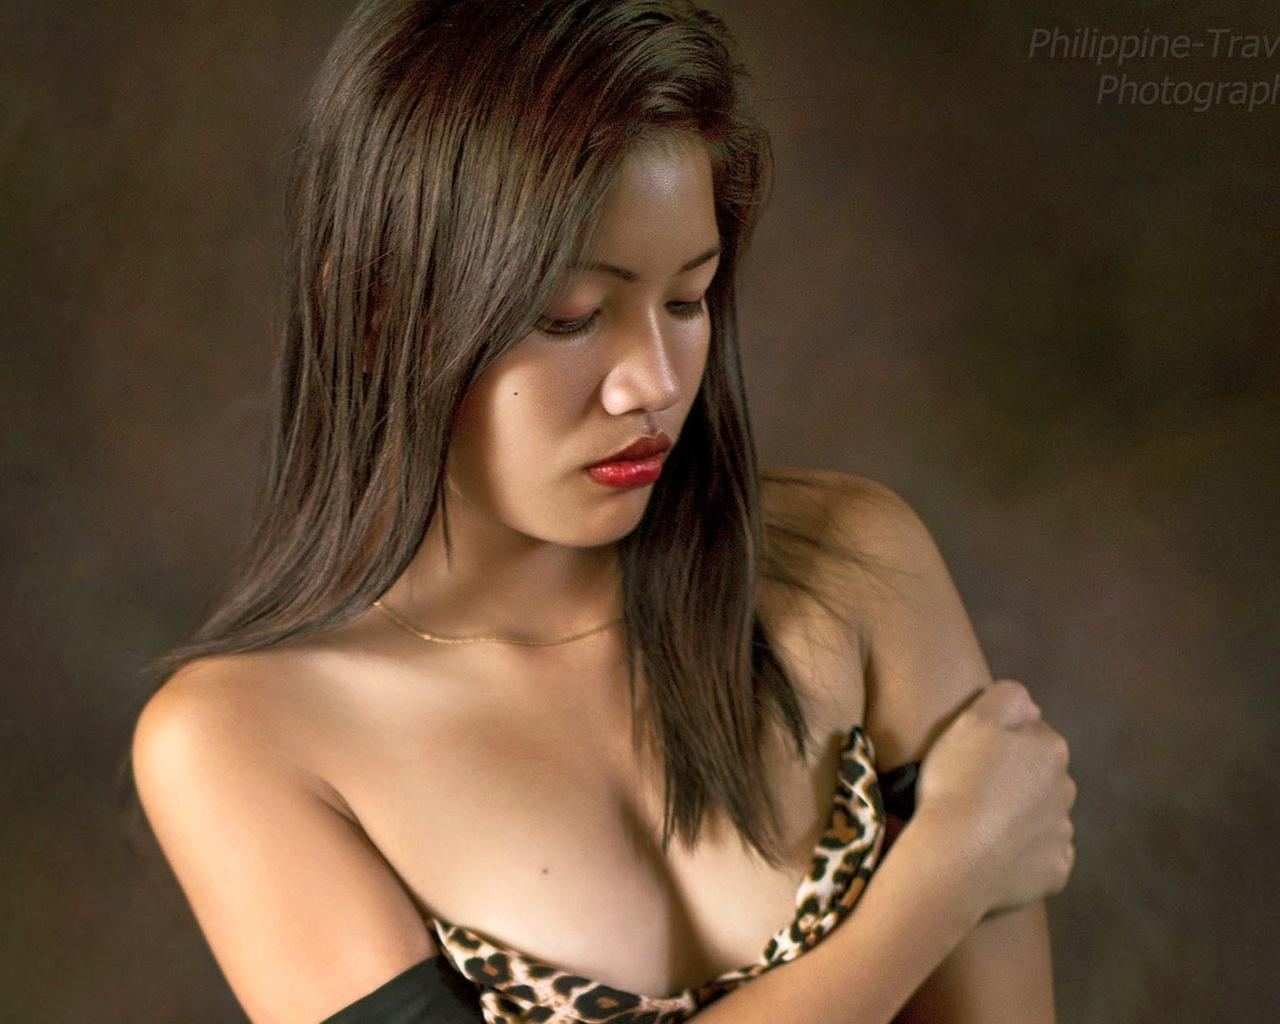 josie, модель, азиатка, декольте, фон, размытый, фотограф, philippine travelclub